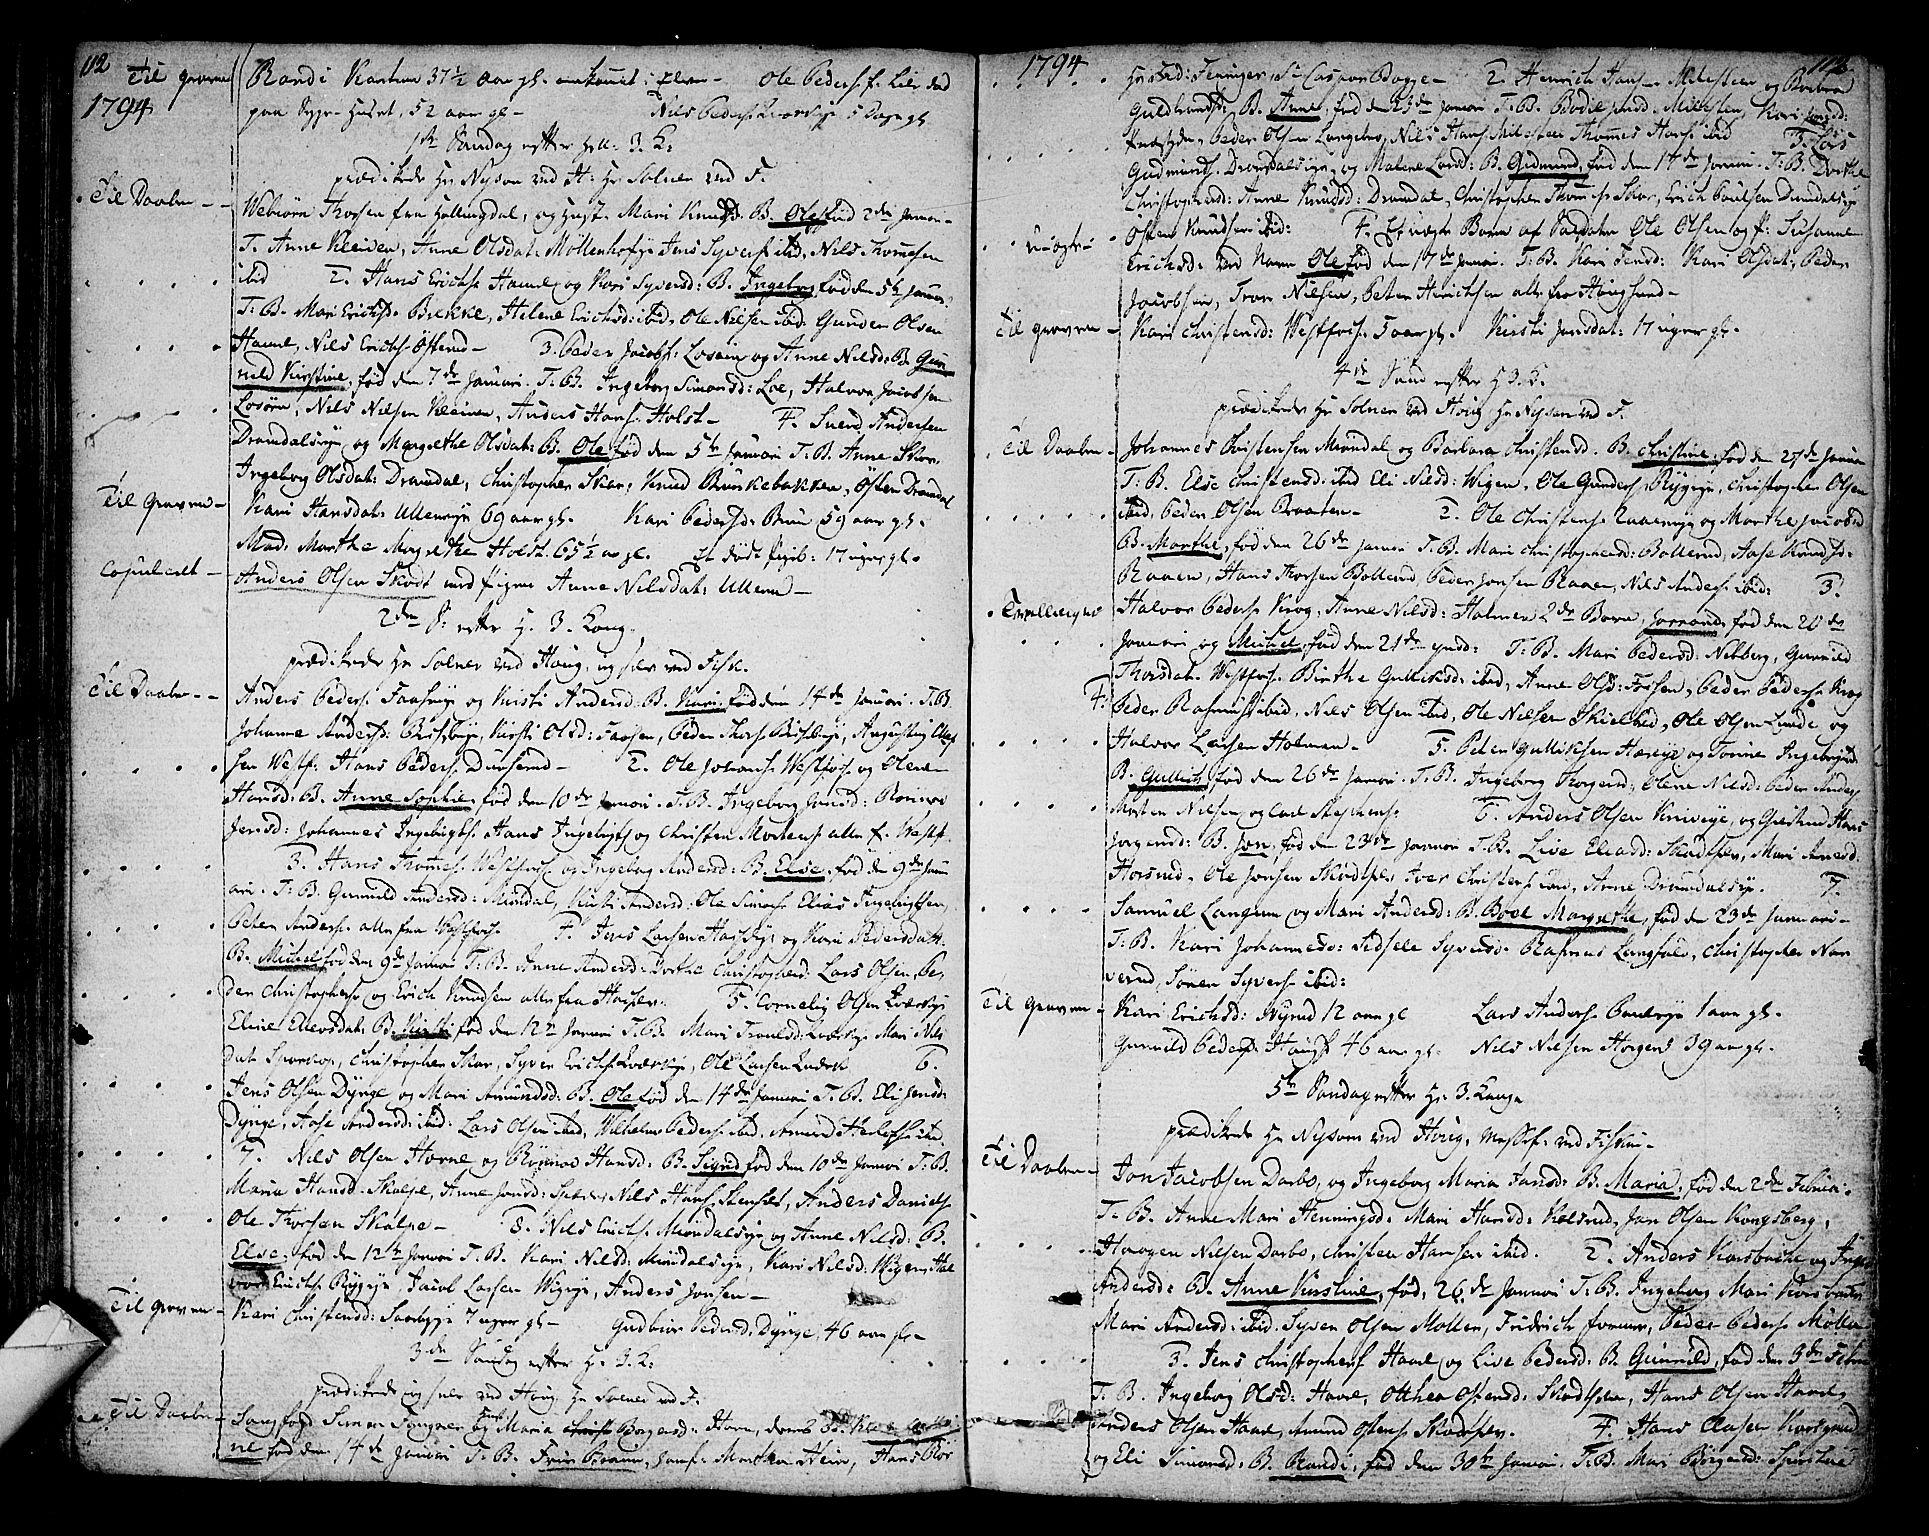 SAKO, Eiker kirkebøker, F/Fa/L0009: Ministerialbok nr. I 9, 1789-1806, s. 112-113